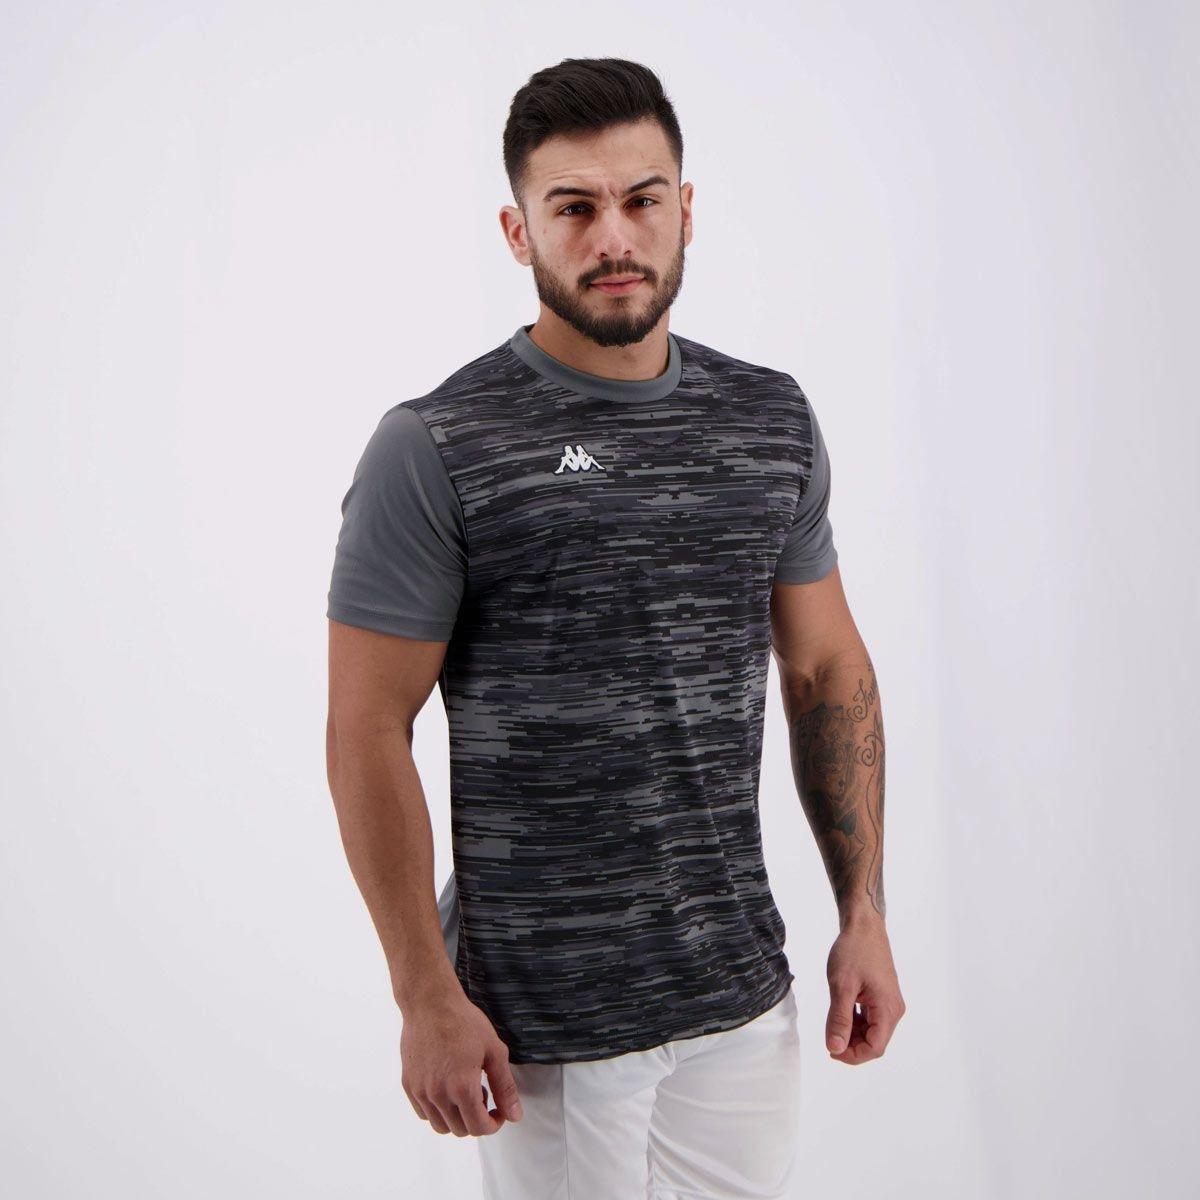 68fc3b1288 Camisa Kappa Jenner Masculina - Chumbo - Compre Agora